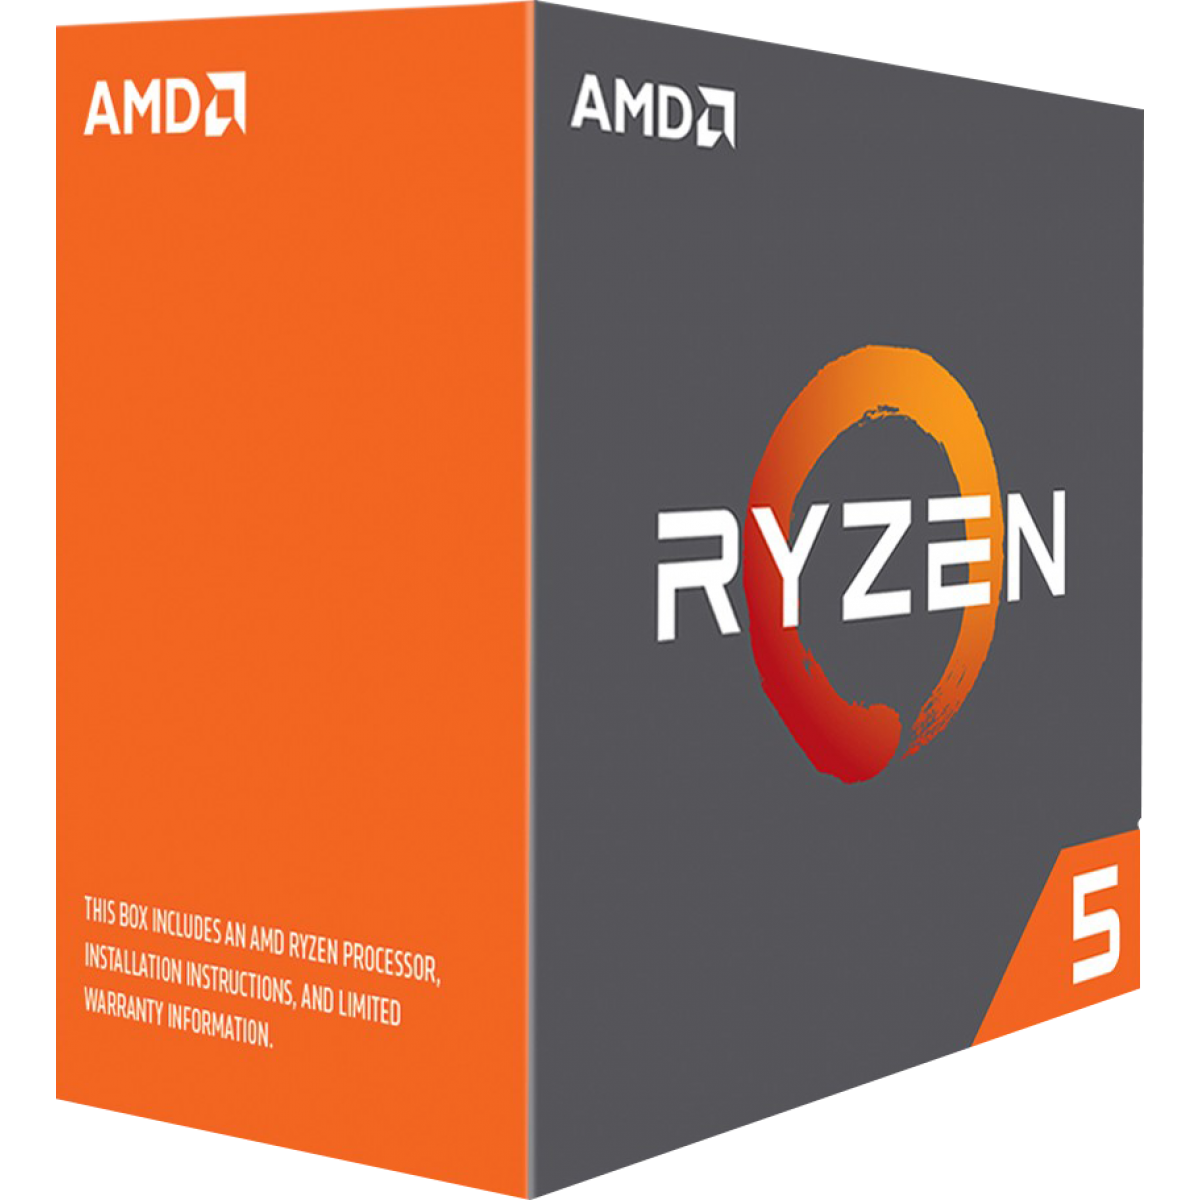 Processador AMD Ryzen 5 1600X 3.6GHz (4.0GHz Turbo), 6-Cores 12-Threads, S/Cooler, AM4, YD160XBCAEWOF, S/ Video